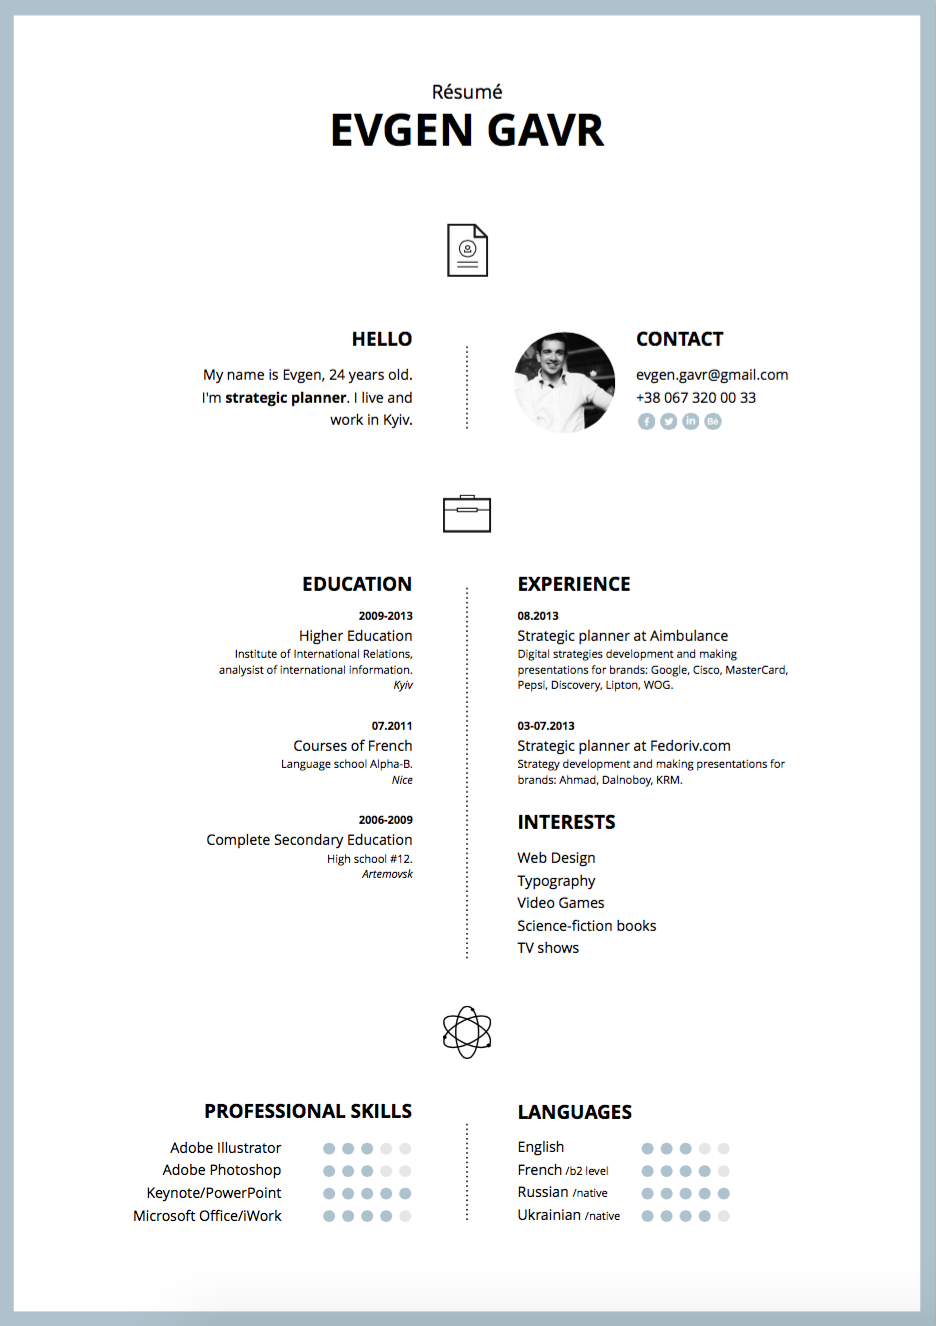 Resume Templates Keynote Resume Templates Resume Template Word Resume Template Free Resume Templates